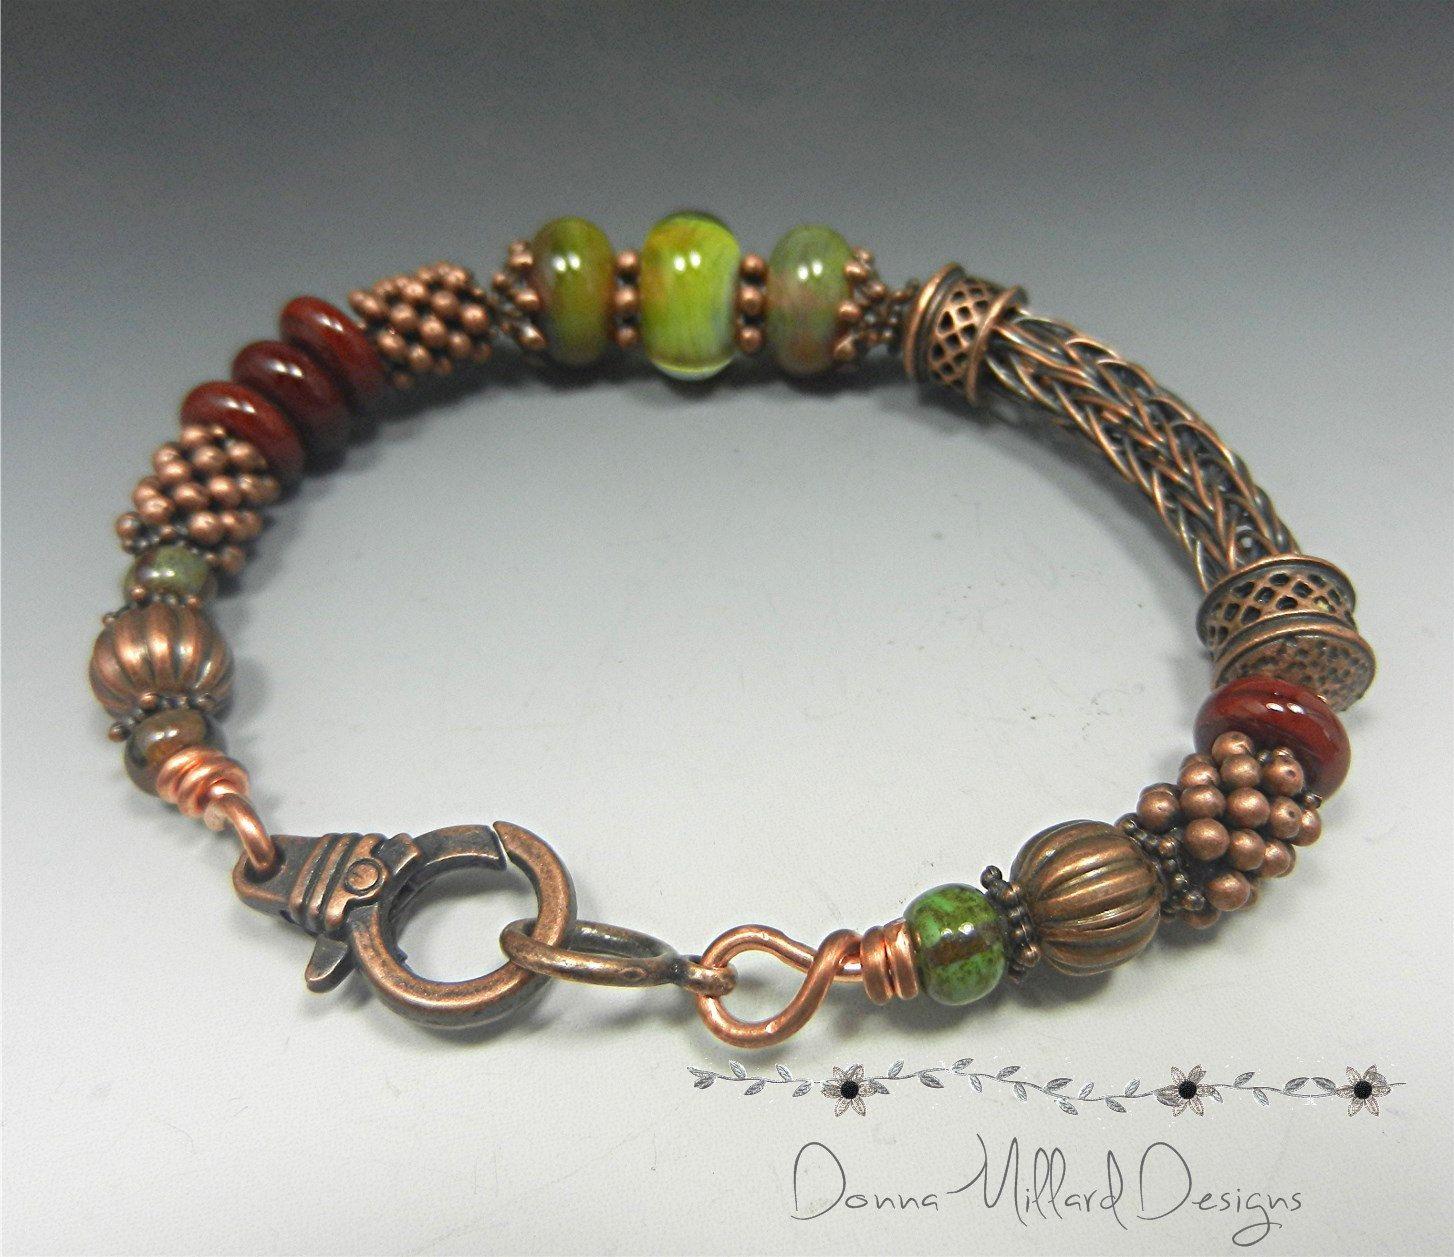 COPPER BRACELET Donna Millard SRA viking knit woven wire gift her ...